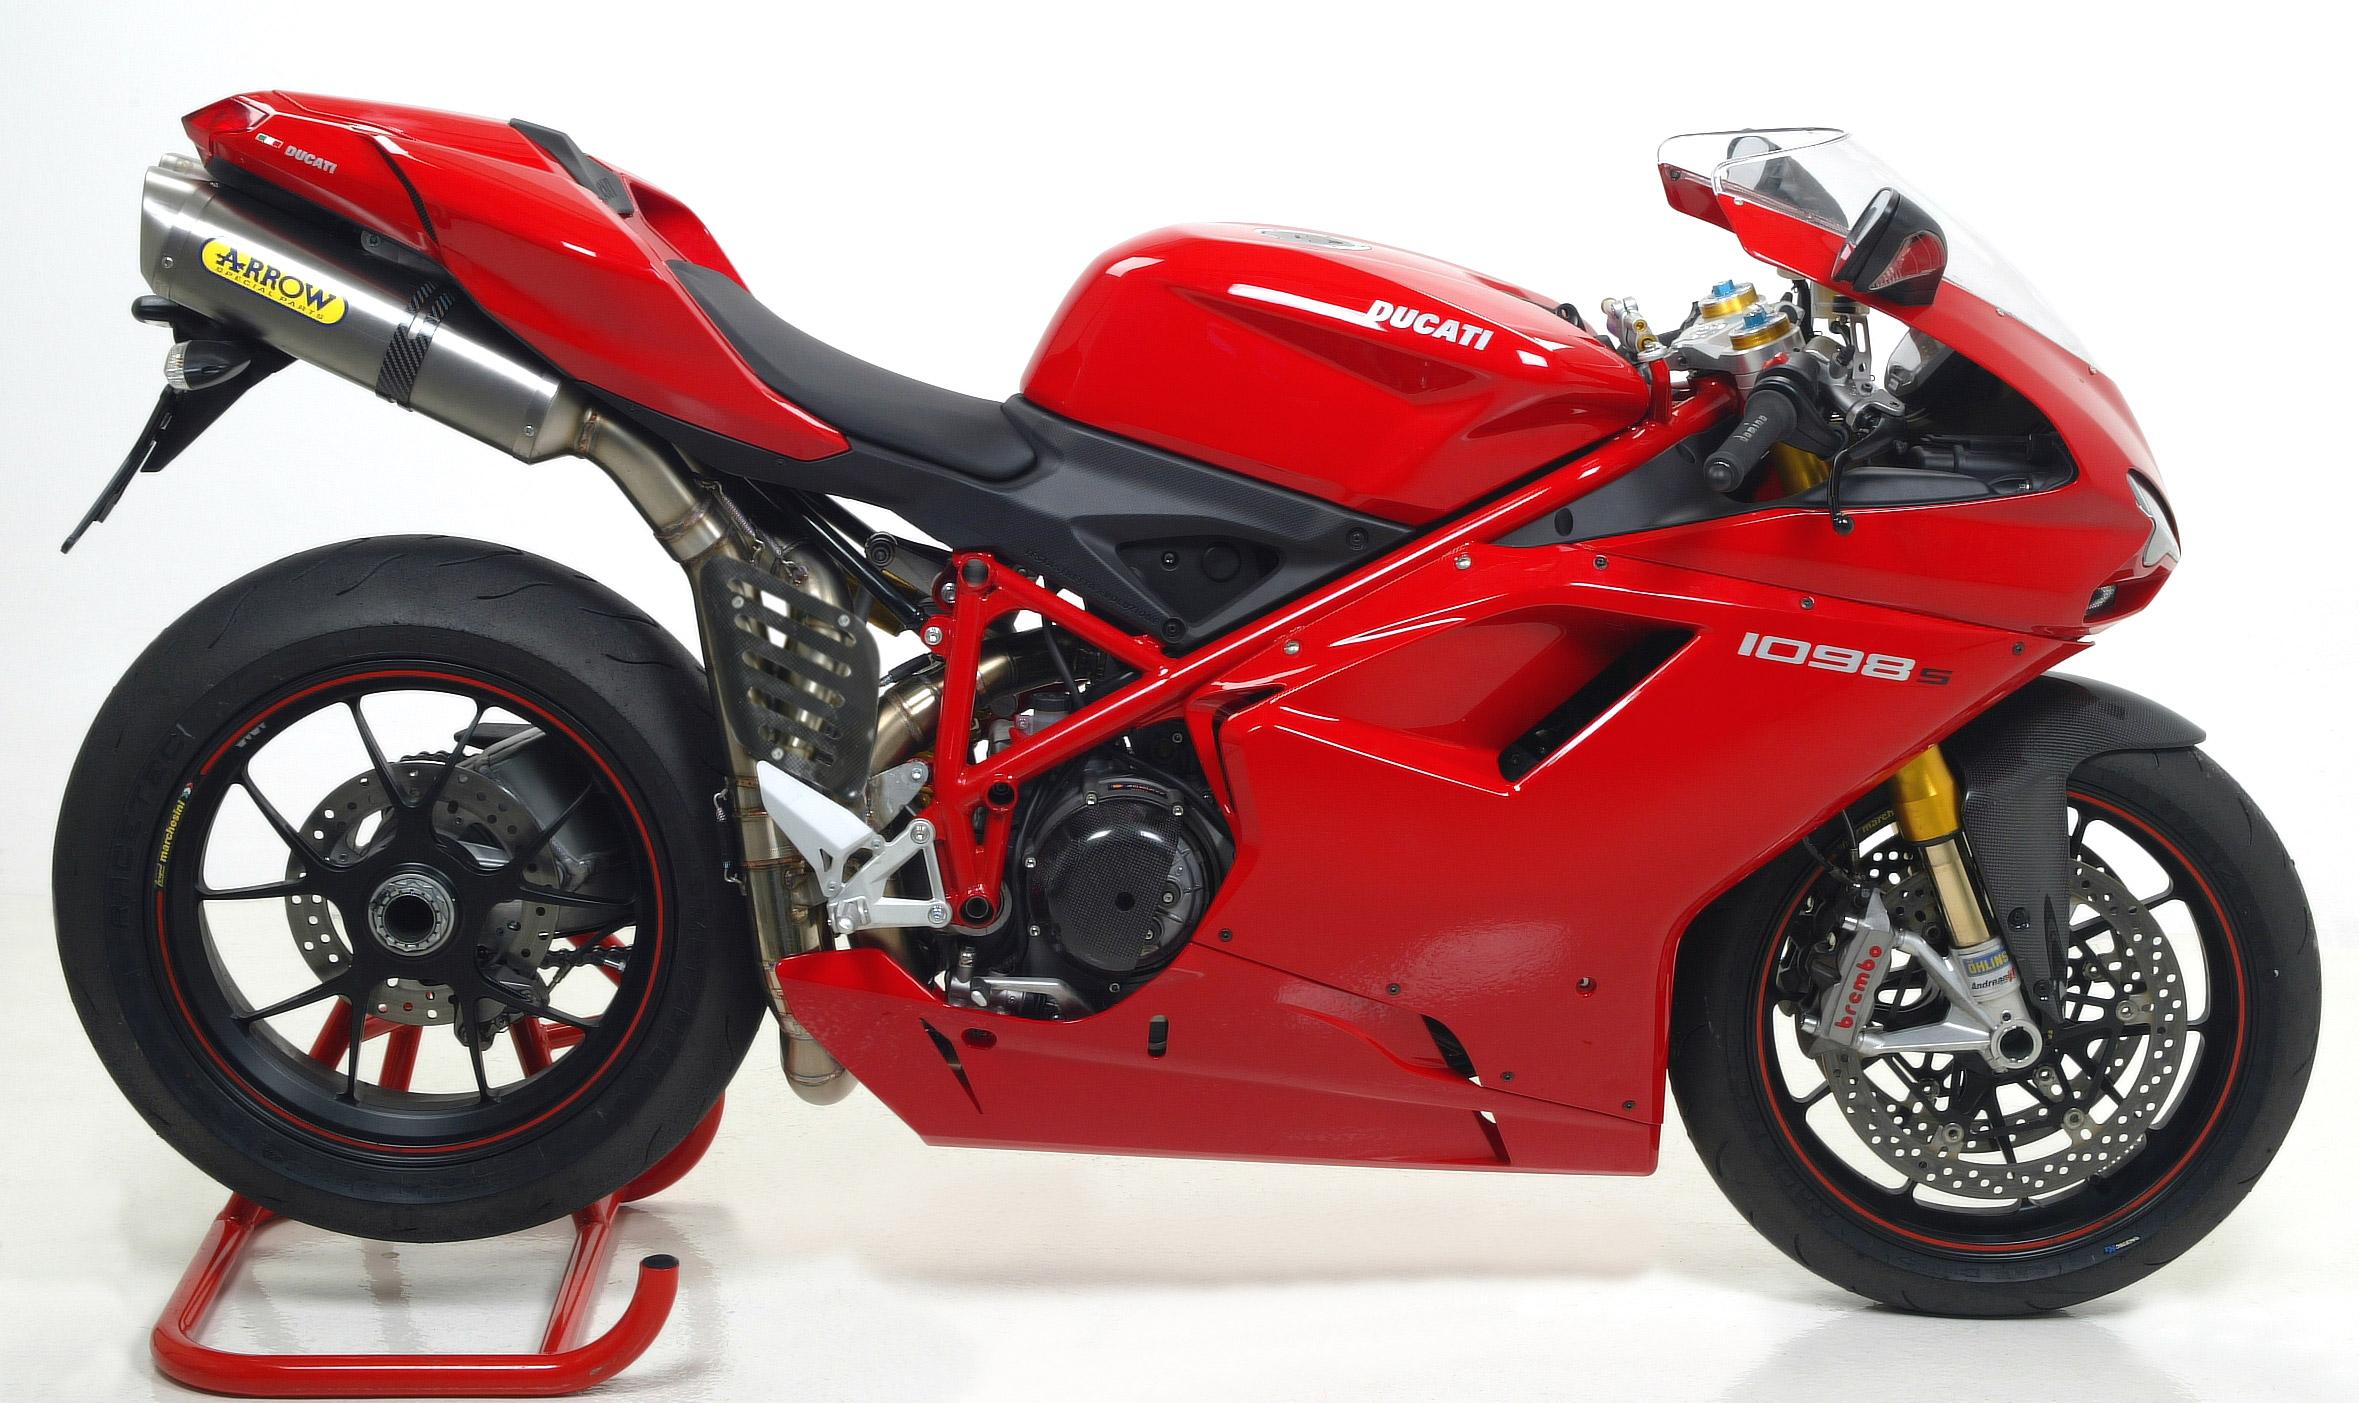 Swell Catalytic Converters Kit Ducati 1098 1098 S 2007 2008 Arrow 11006Kz Wiring 101 Jonihateforg